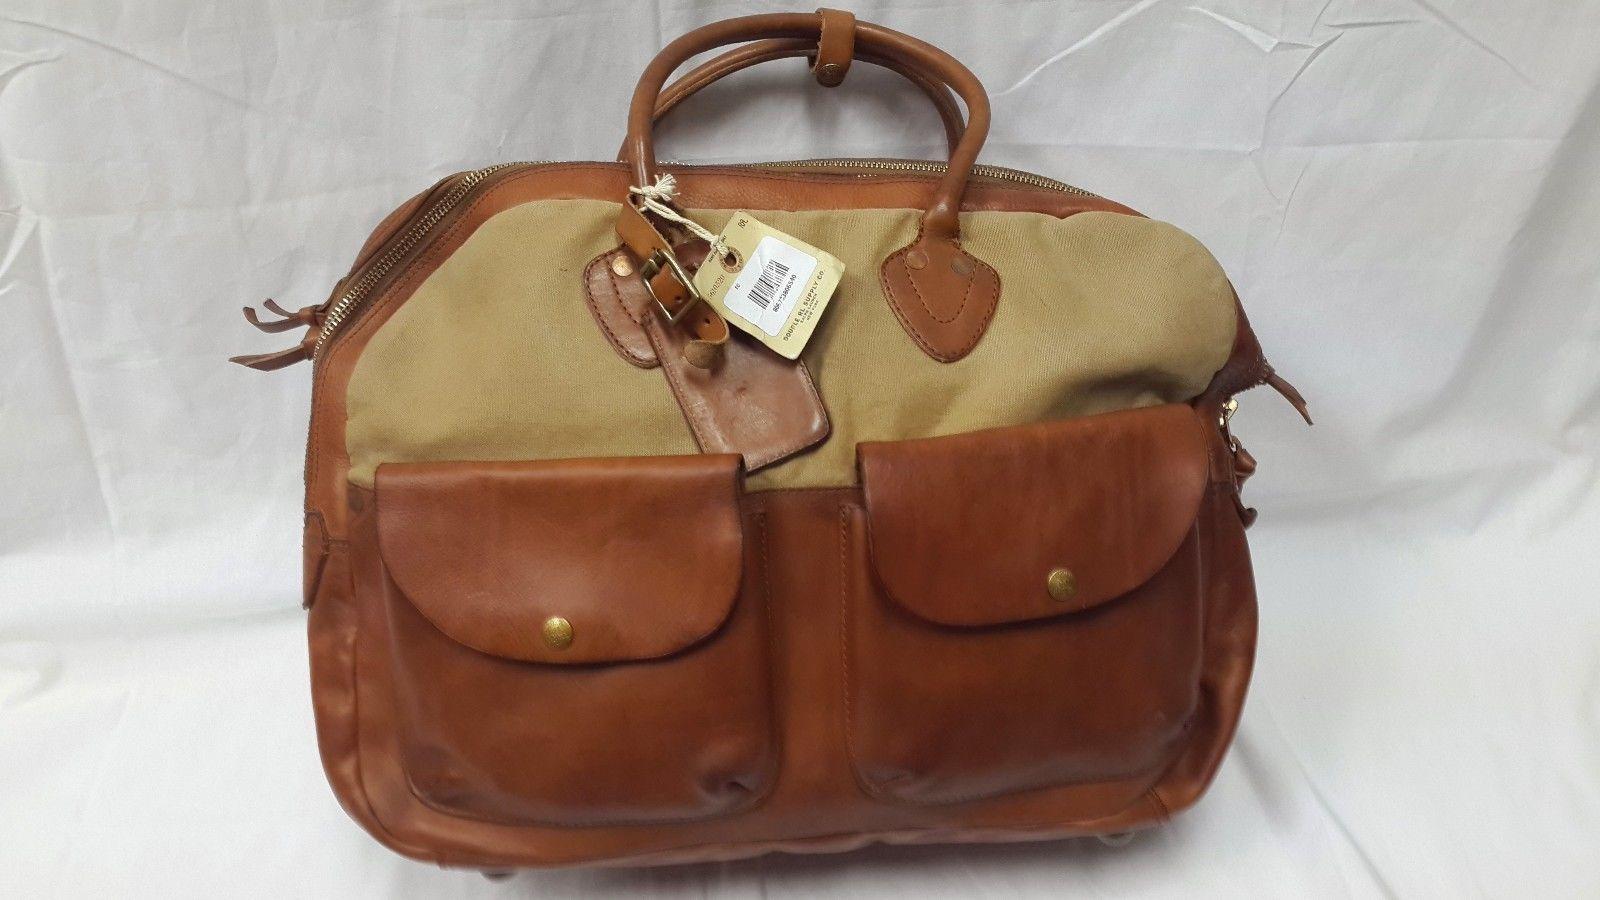 650ecc89ed Ralph Lauren RRL Double RL Leather and Canvas Cargo Bag